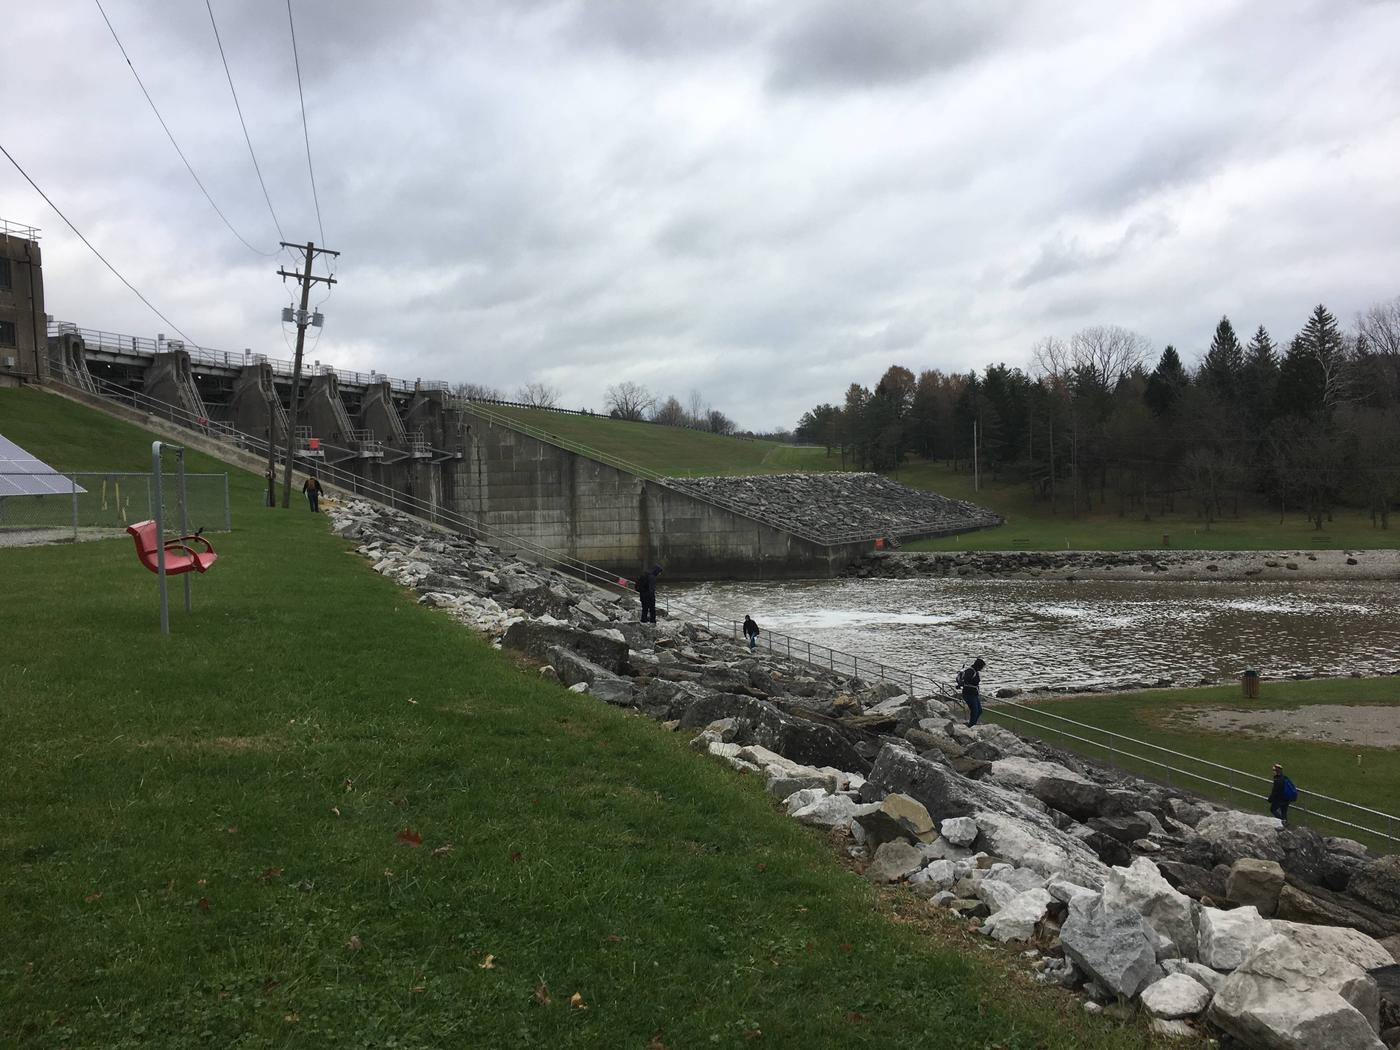 DELAWARE LAKE DAMSITE SHELTERSview of Delaware Dam